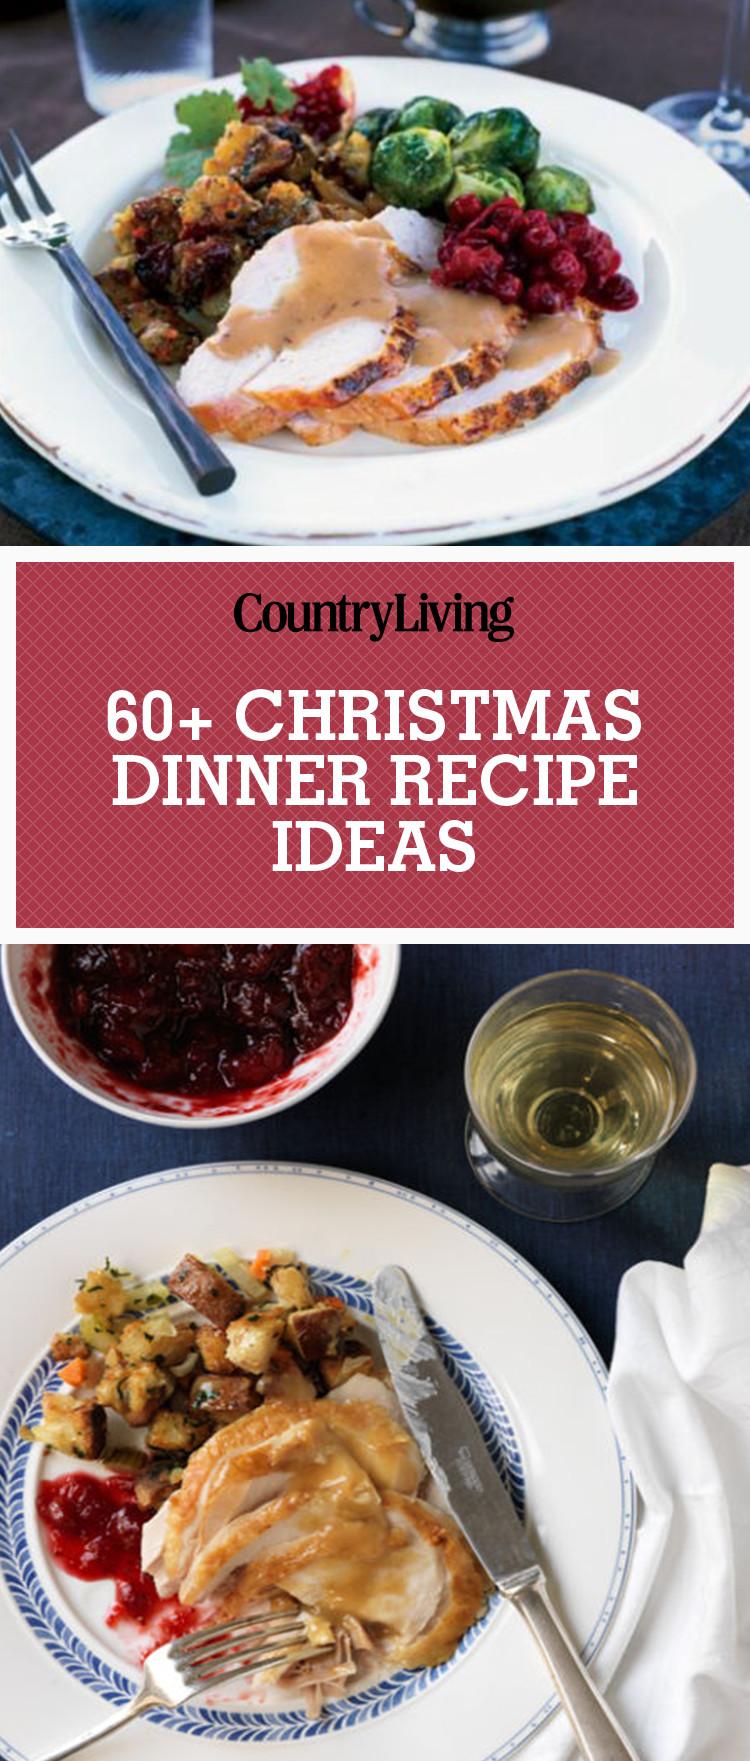 Christmas Dinner Recipes  70 Easy Christmas Dinner Ideas Best Holiday Meal Recipes